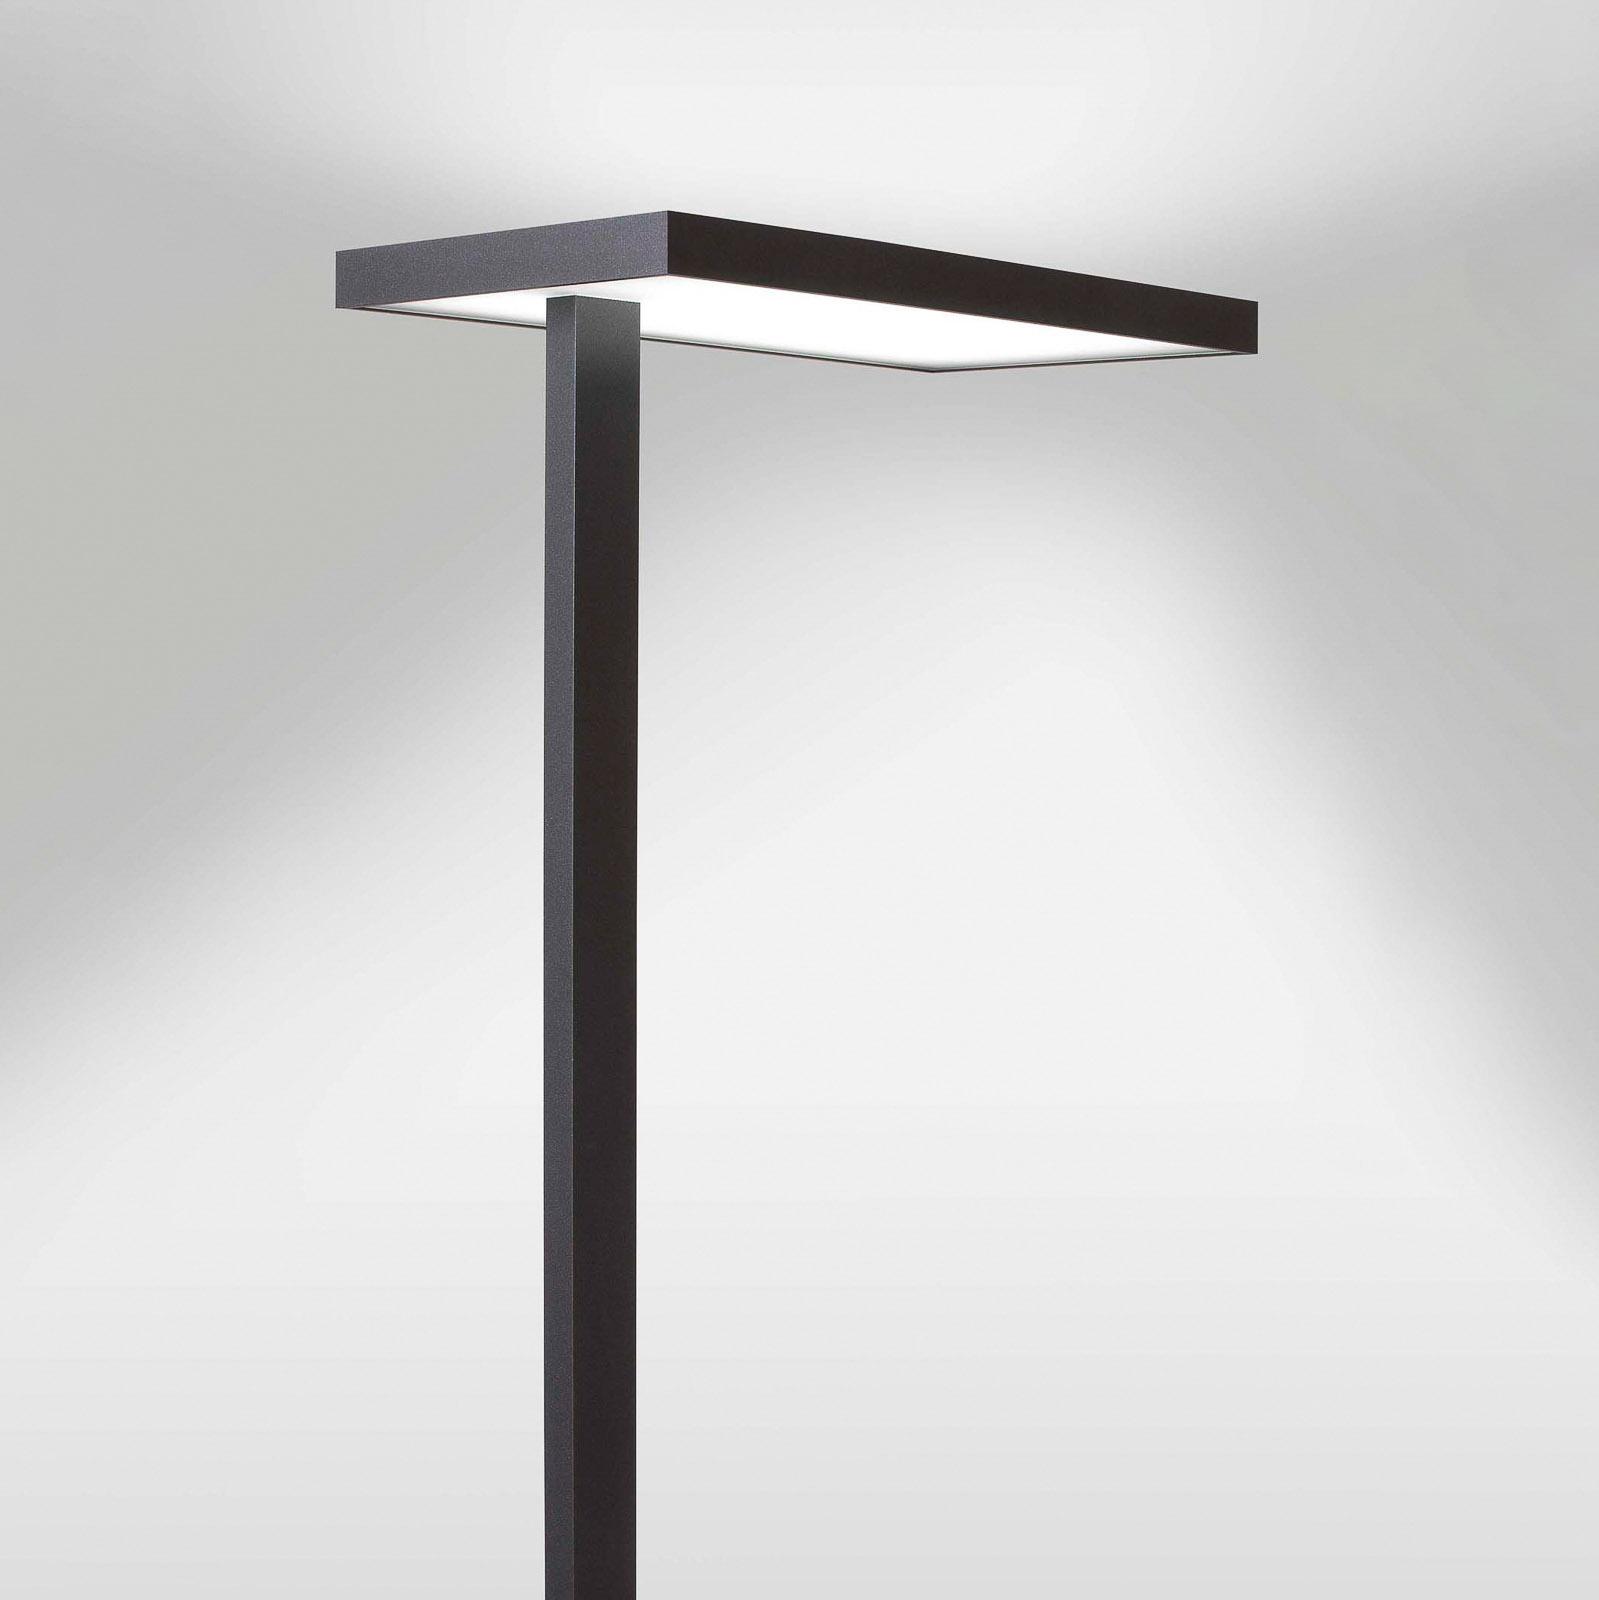 Lampa stojąca biurowa LED Lola, 3000K, DALI